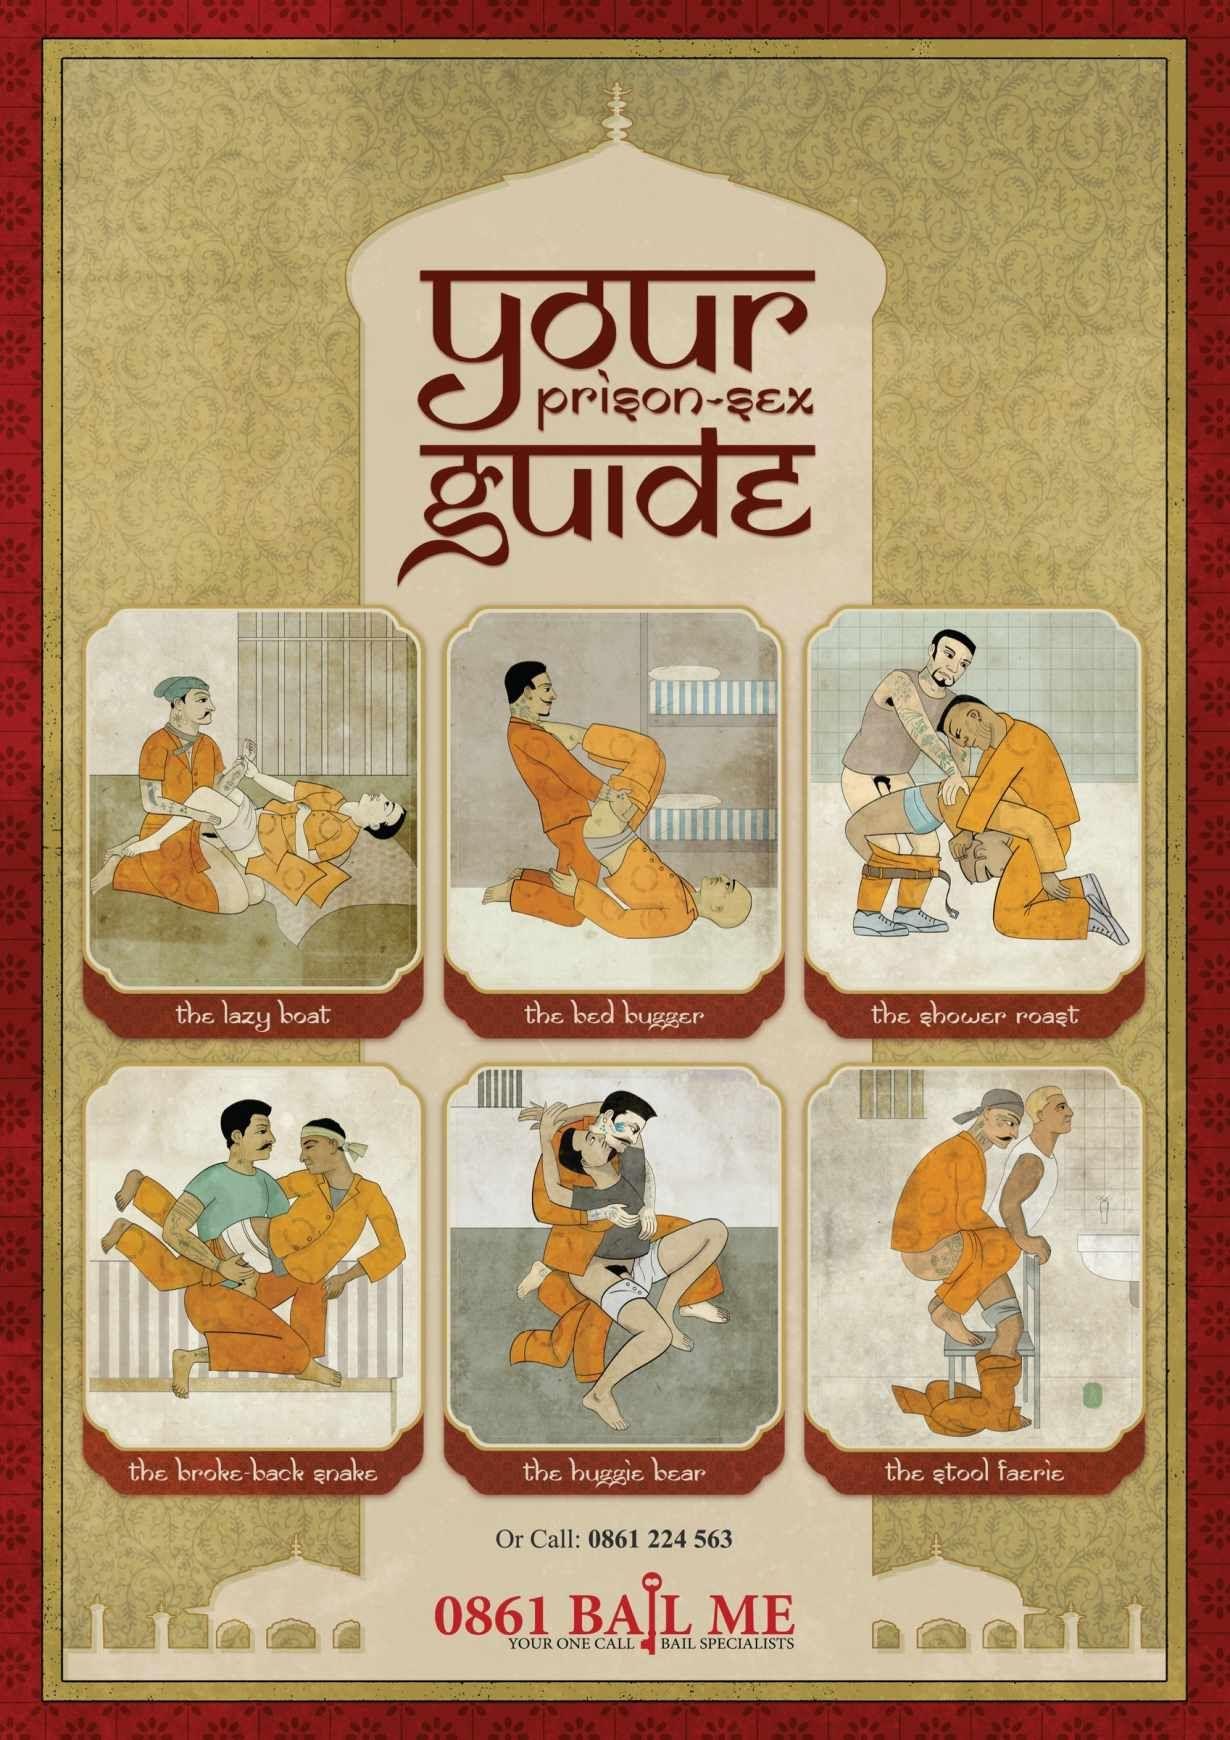 Guide to kamasutra